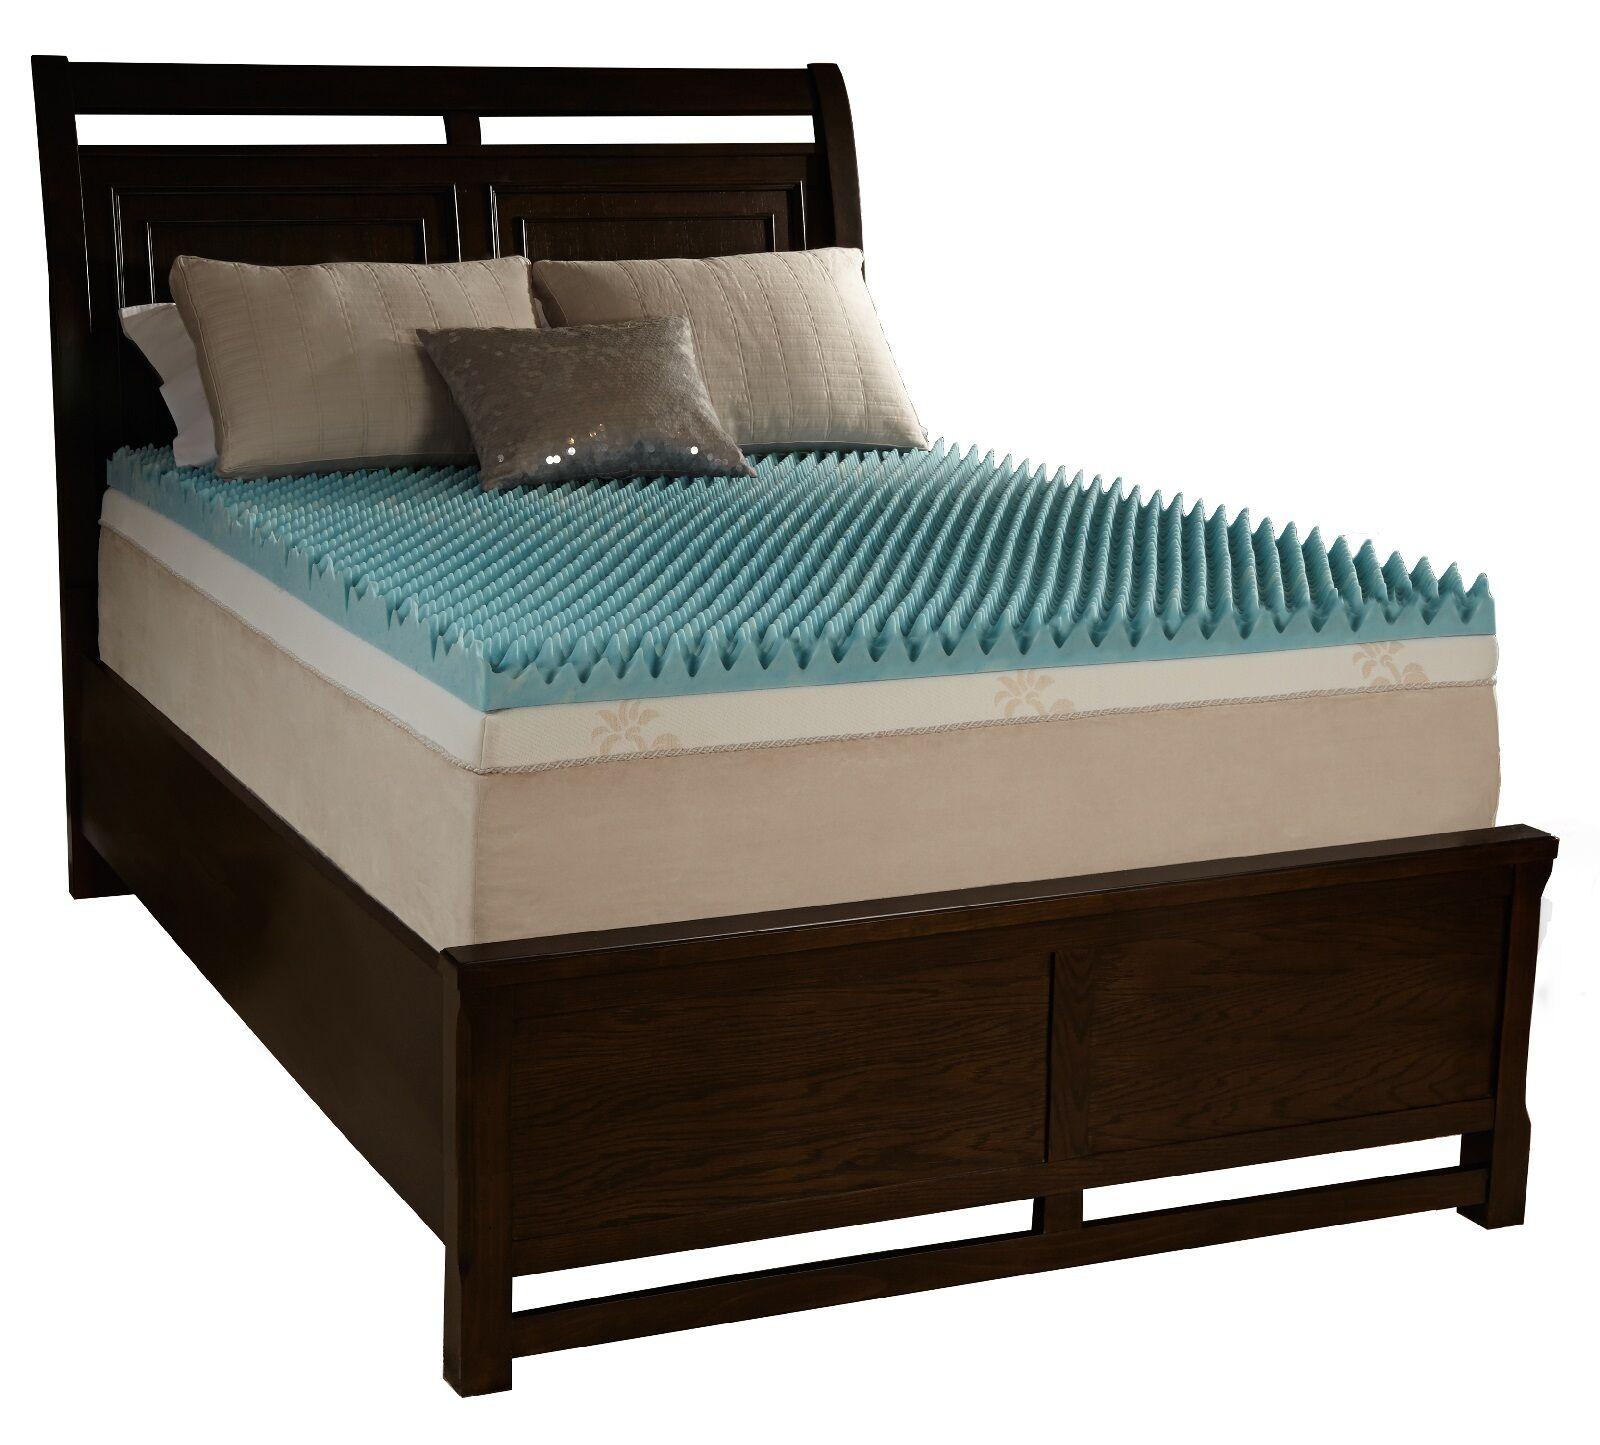 "2"" Cal King Egg Crate Foam Mattress Topper Beautyrest Gel Memory Bed  Cushion Pad"